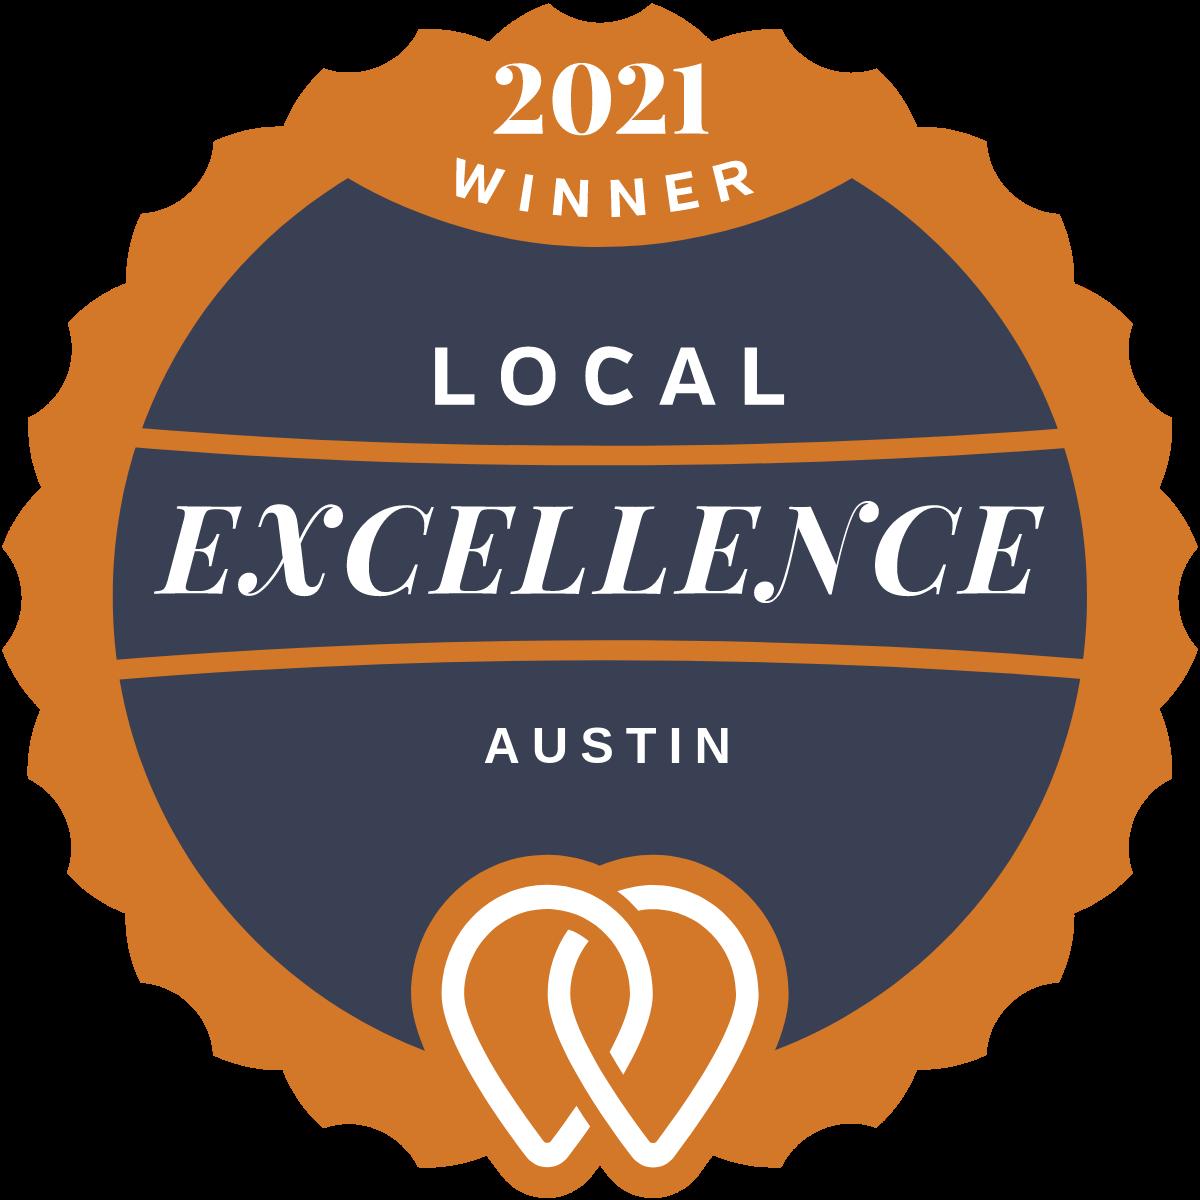 2021 Local Excellence Award Winner